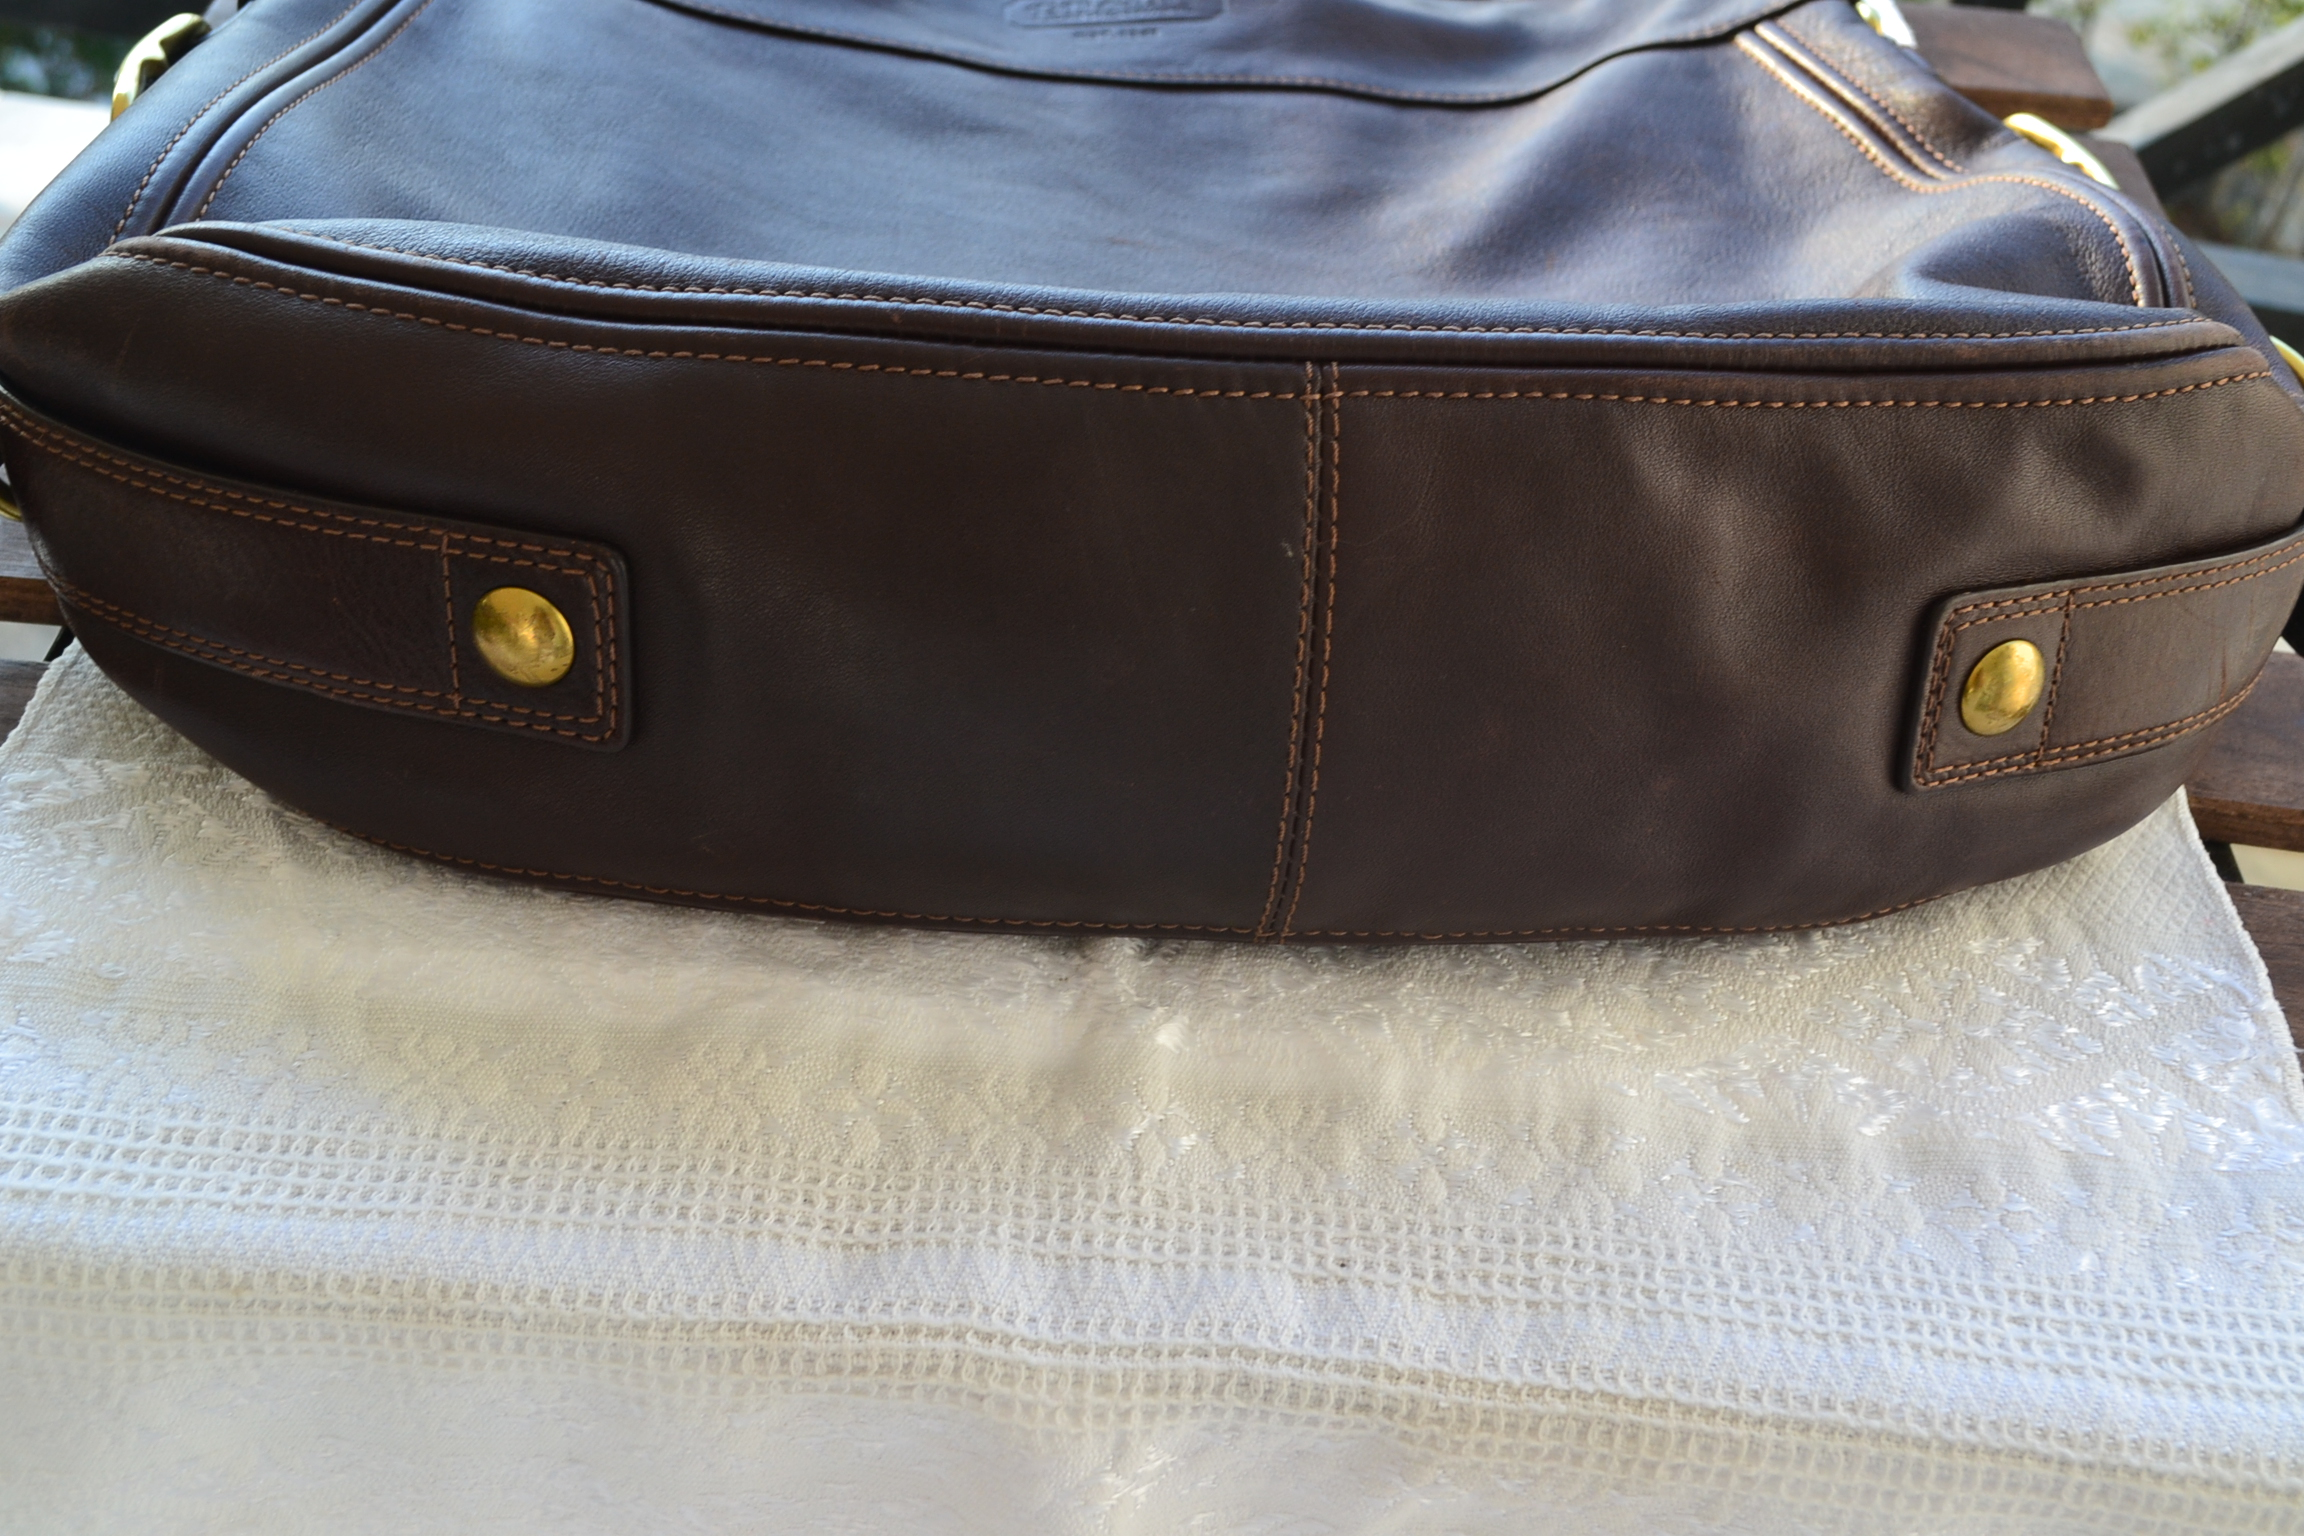 43c10c02f4 Τσάντα δερμάτινη αυθεντική COACH σέ καφέ χρώμα vintage - Vintage ...